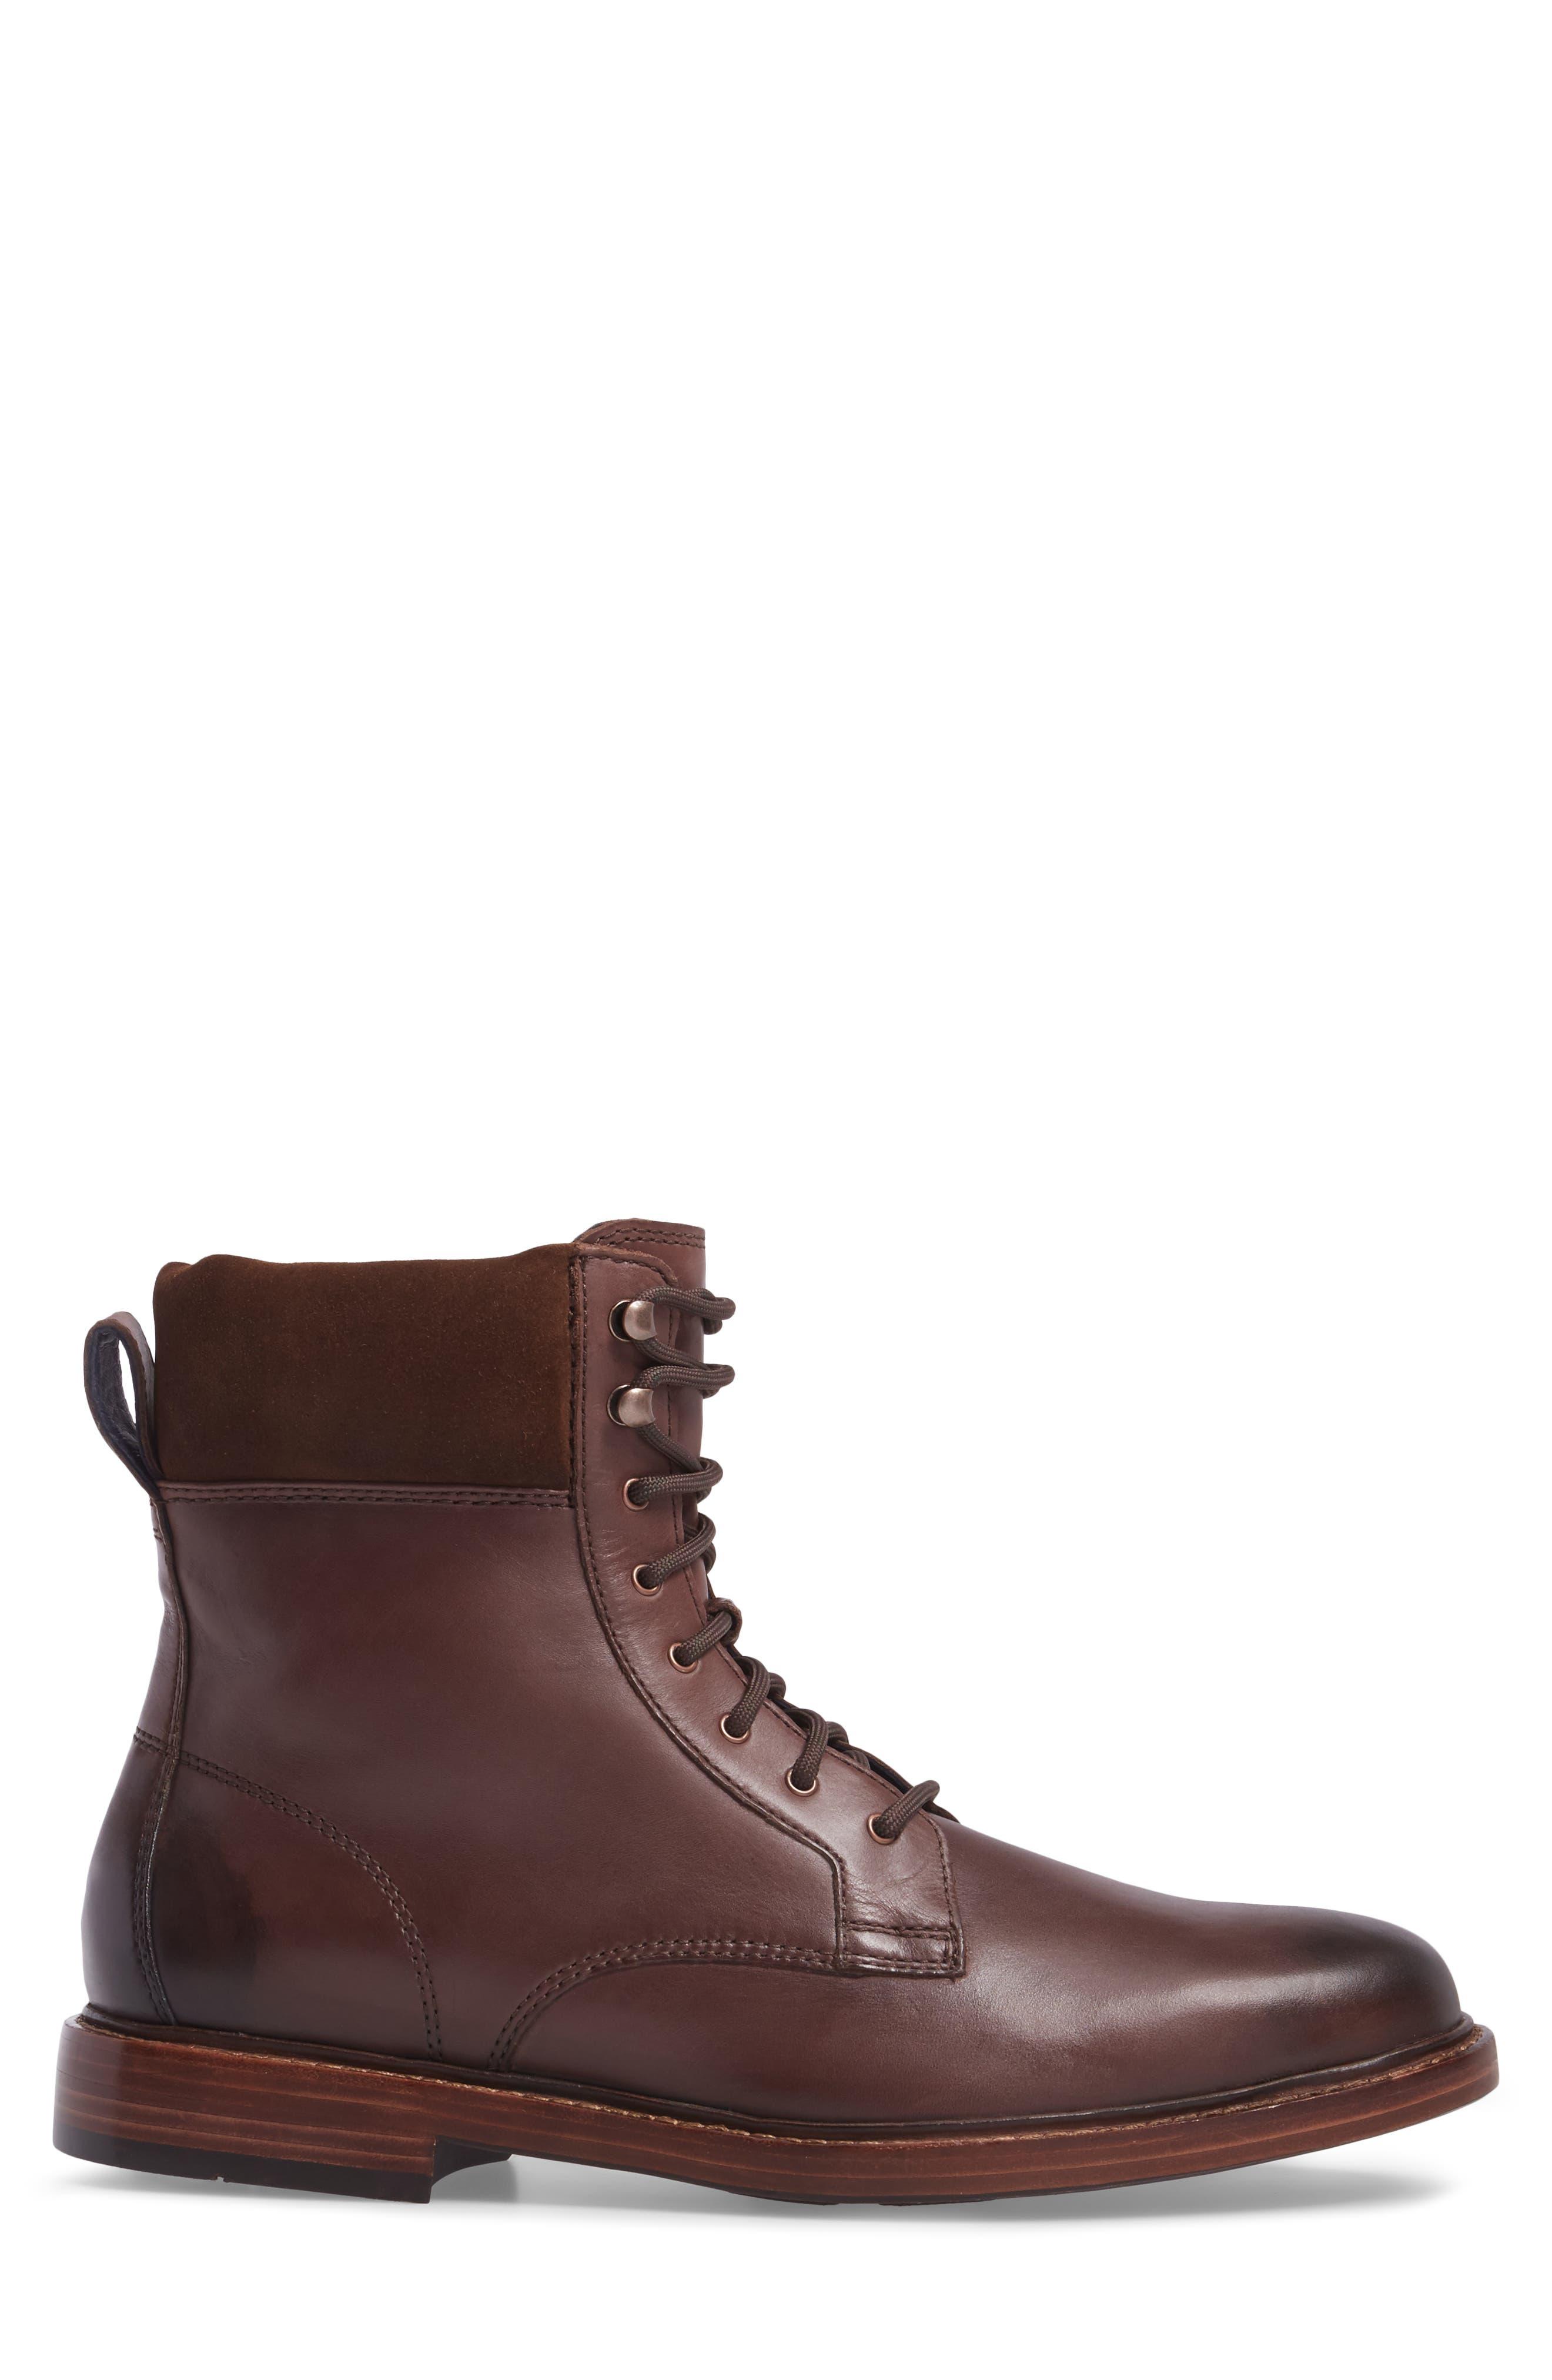 Tyler Grand Plain Toe Boot,                             Alternate thumbnail 3, color,                             205